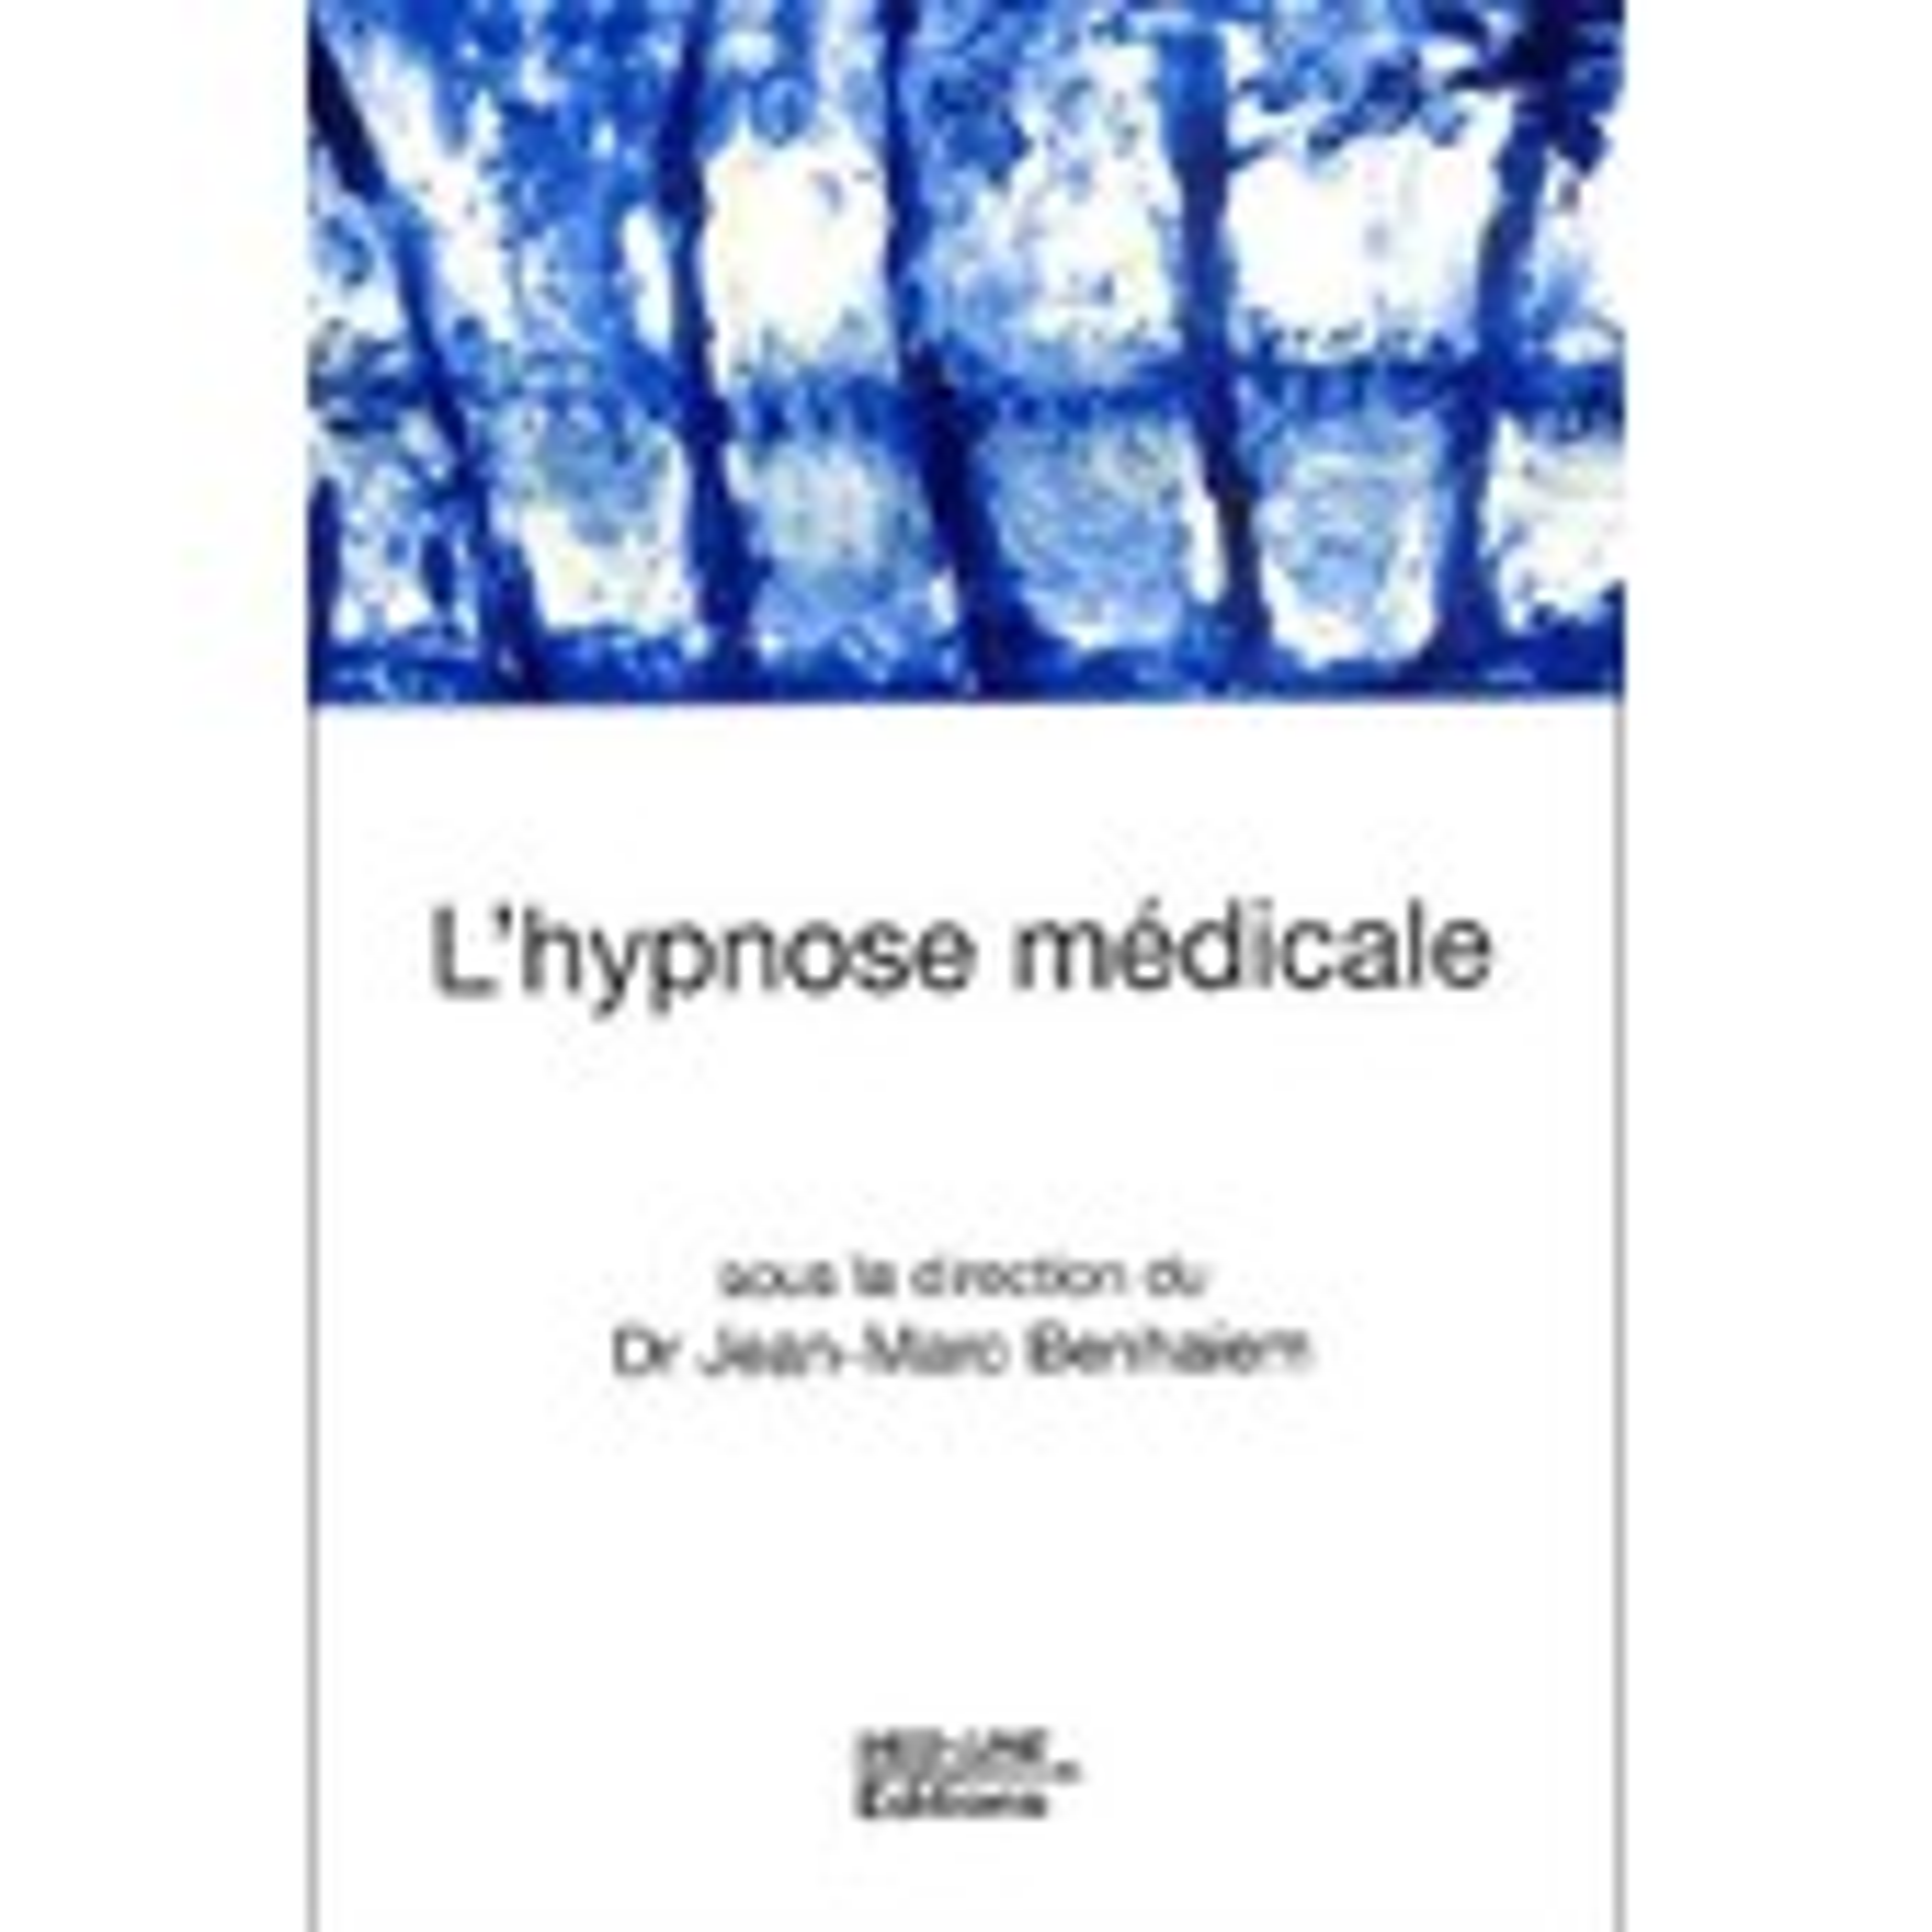 L'hypnose M�dicale de Jean-Marc Benhaiem